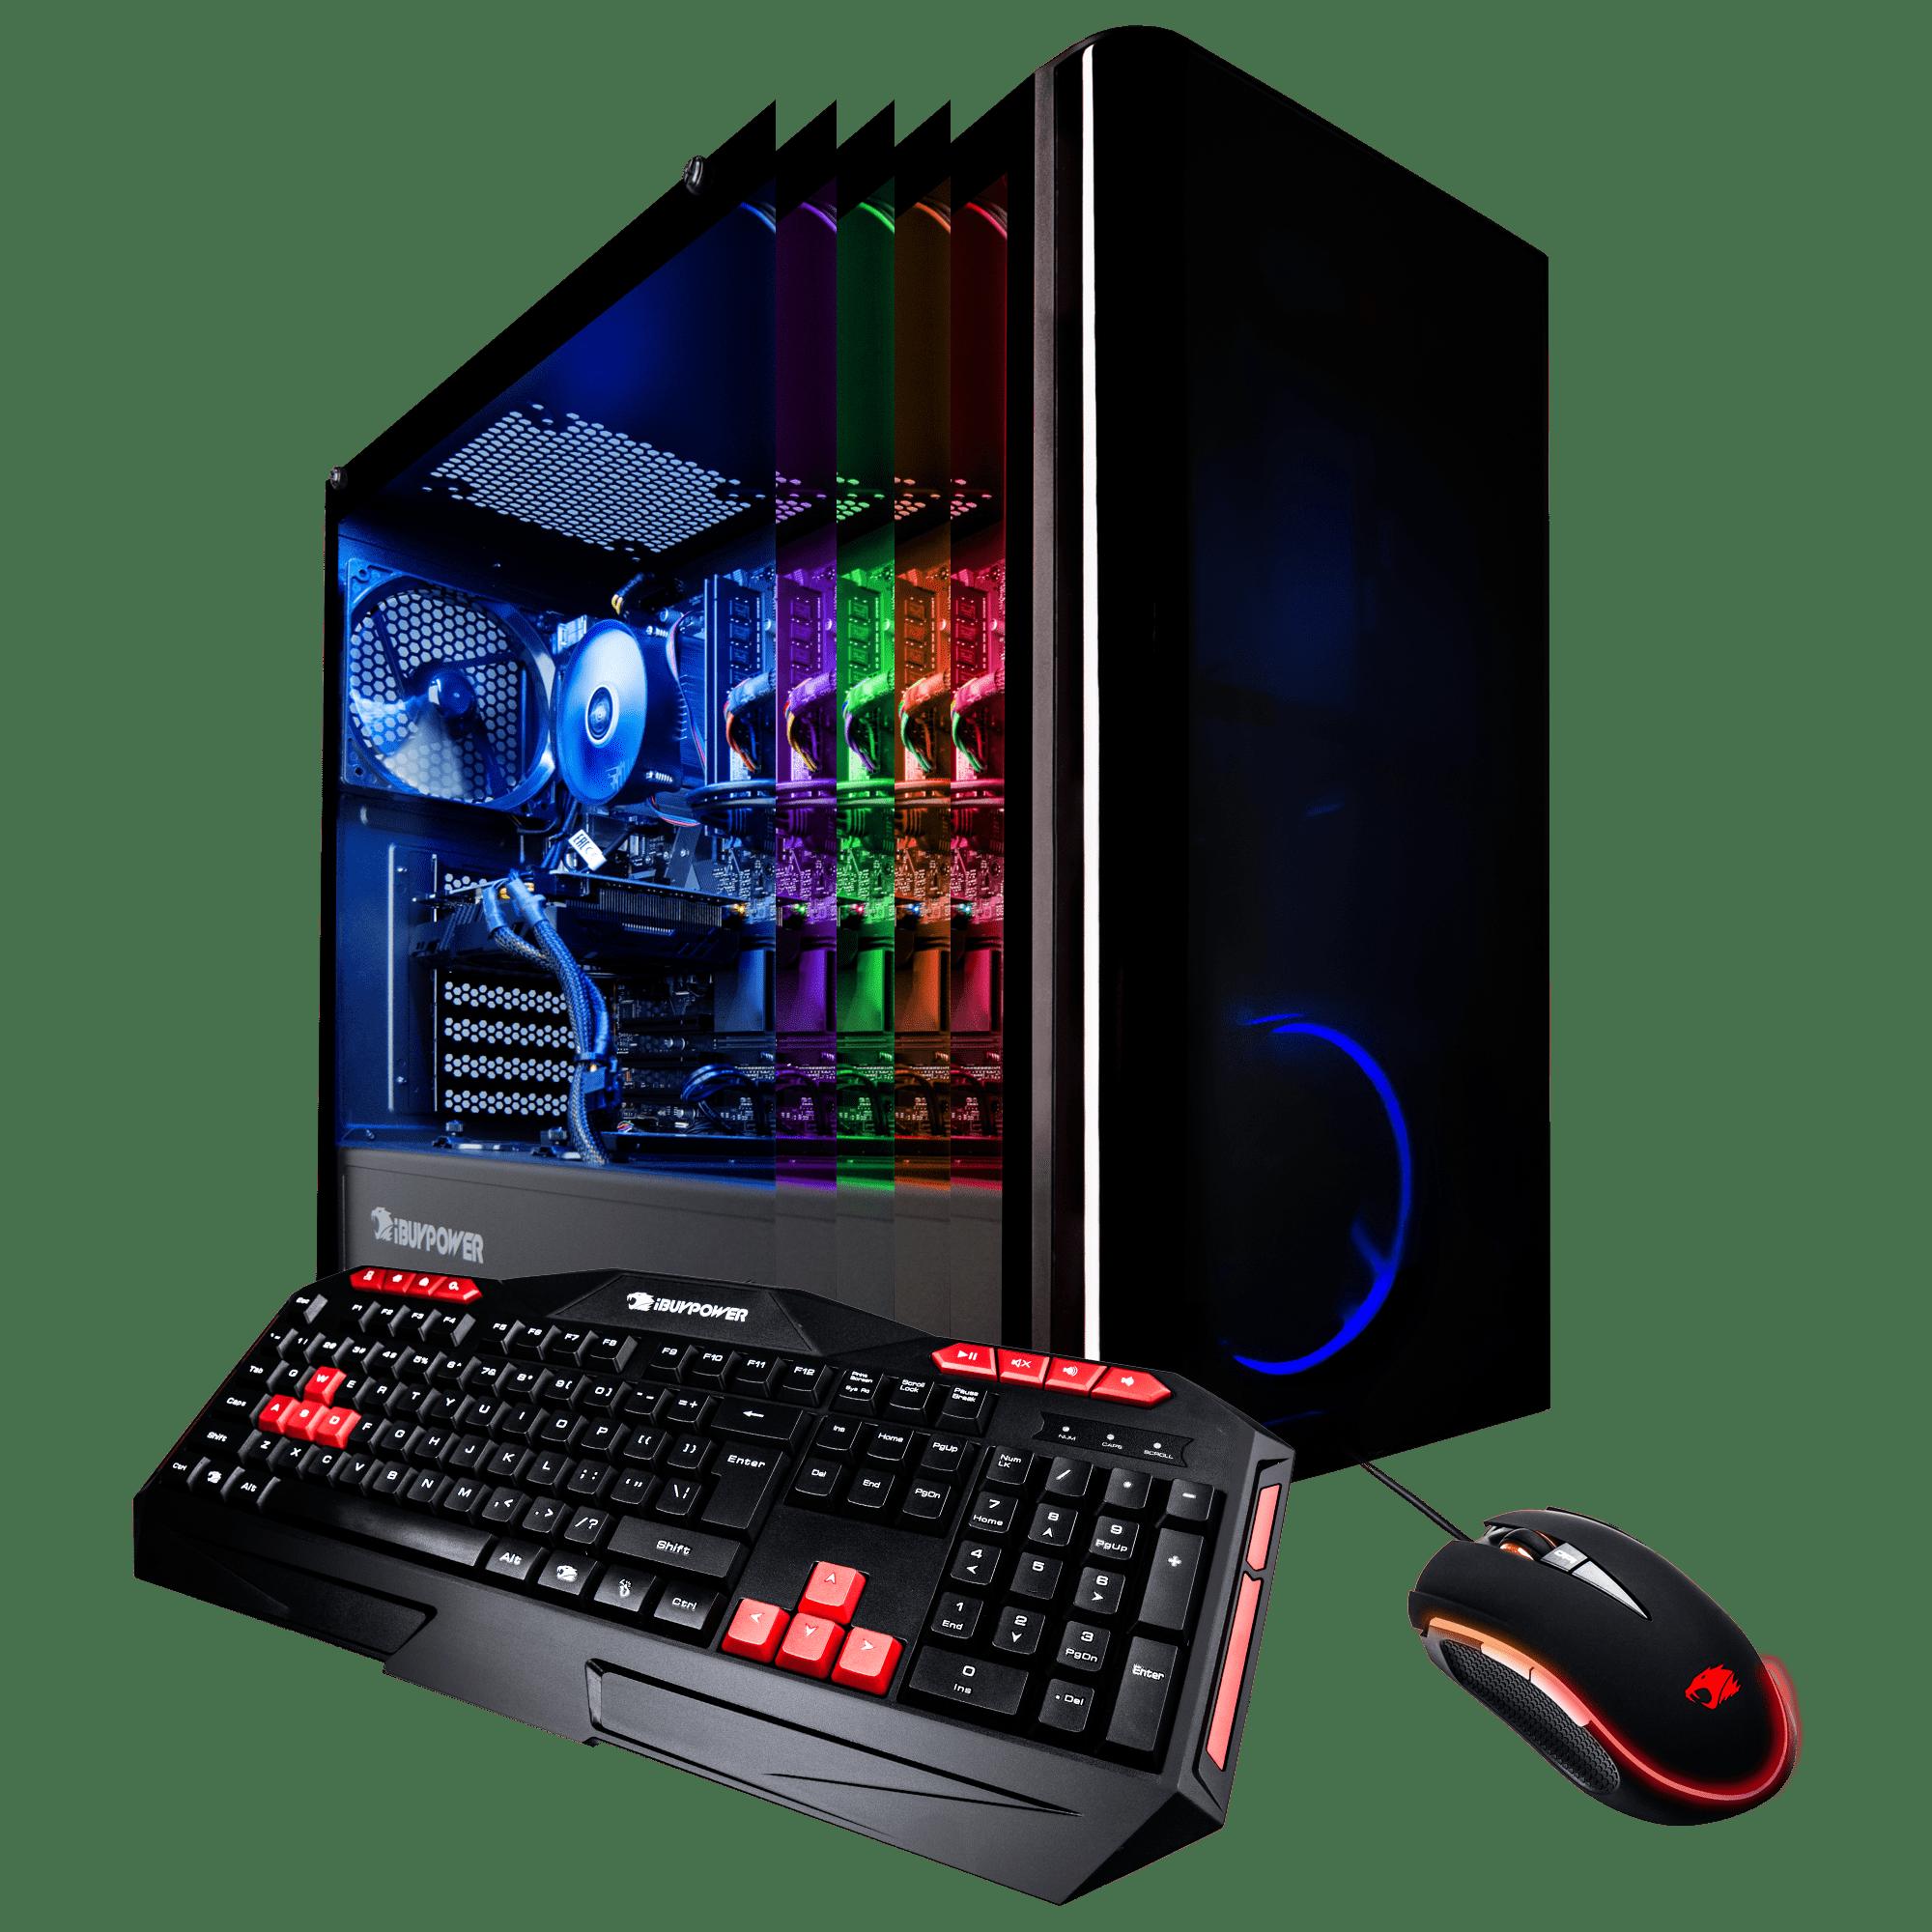 iBUYPOWER View9000W - Gaming Desktop PC - VR Ready - Intel i7 8700 - 16GB Memory - NVIDIA GeForce GTX 1070 8GB - 240GB SSD - 1TB Hard Drive - Wi-Fi - Windows 10 Home 64-Bit (Available in stores)